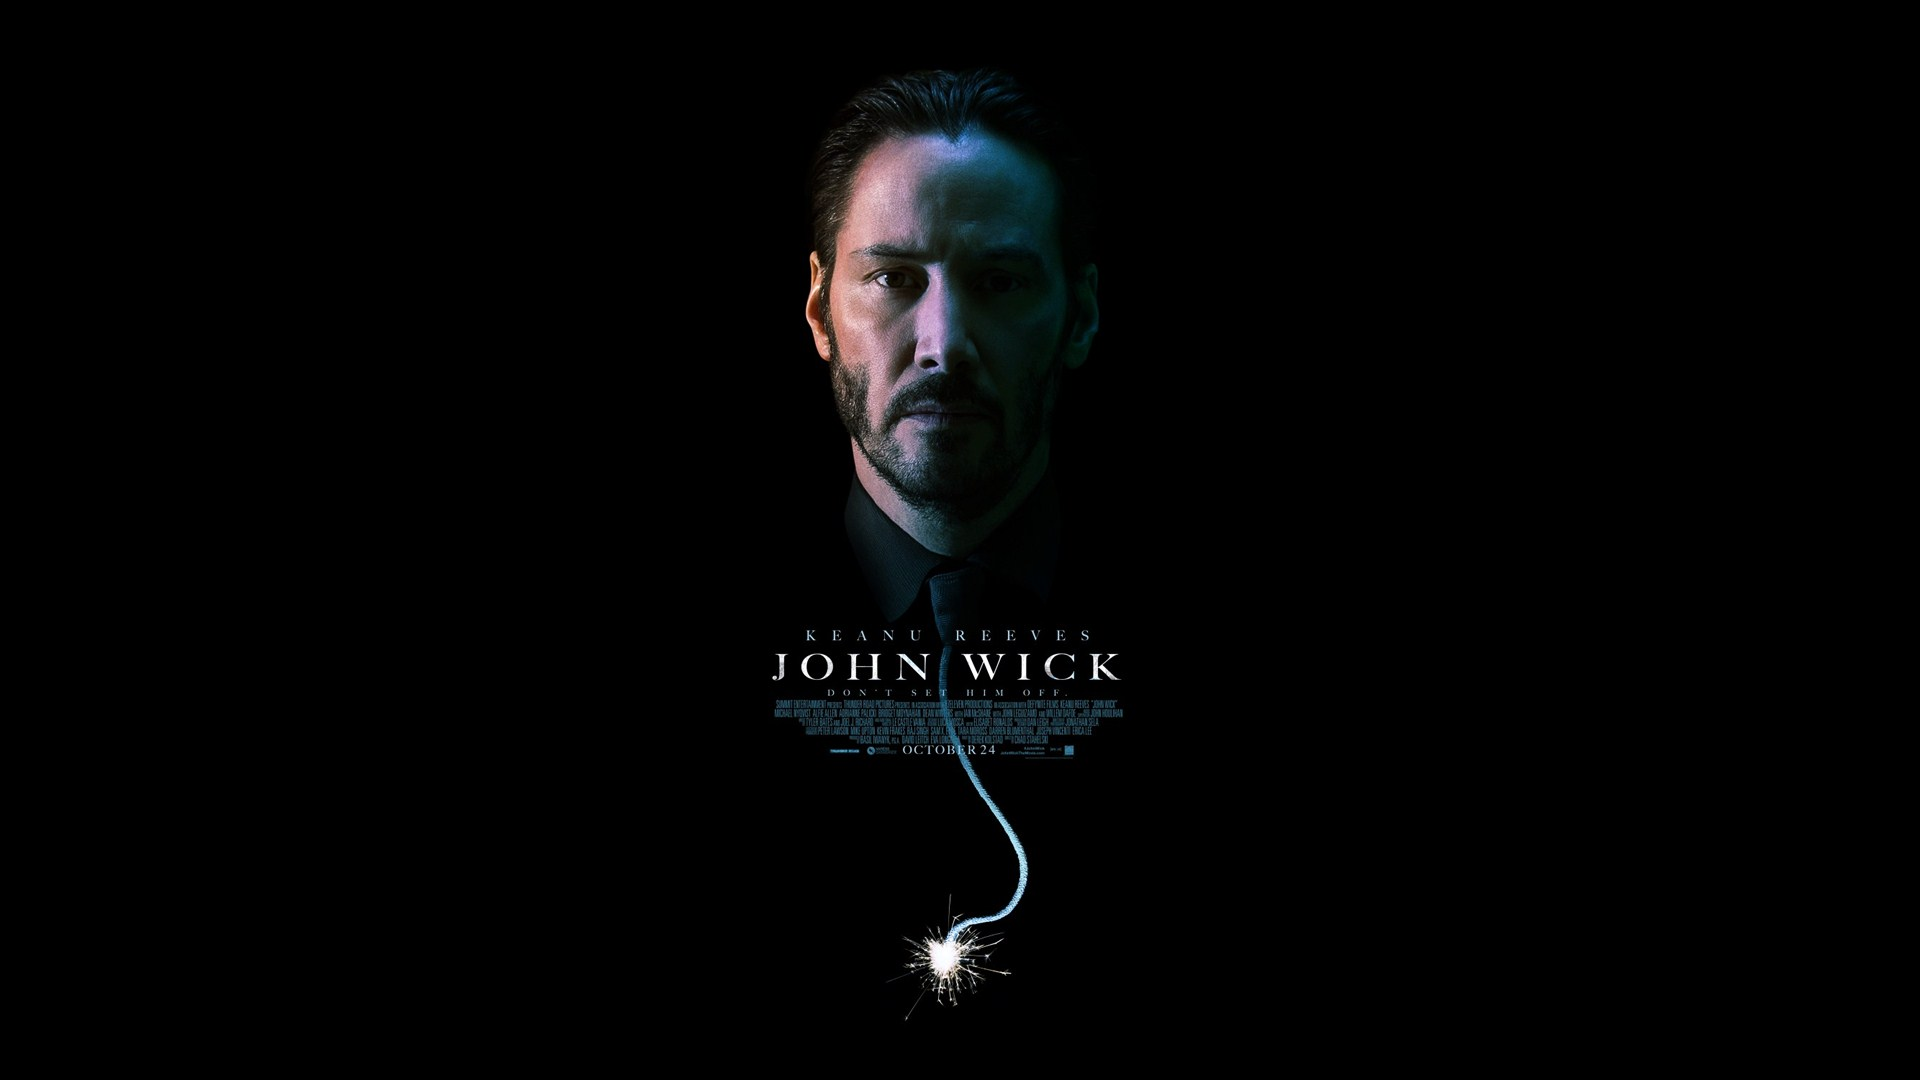 John Wick wallpaper 3